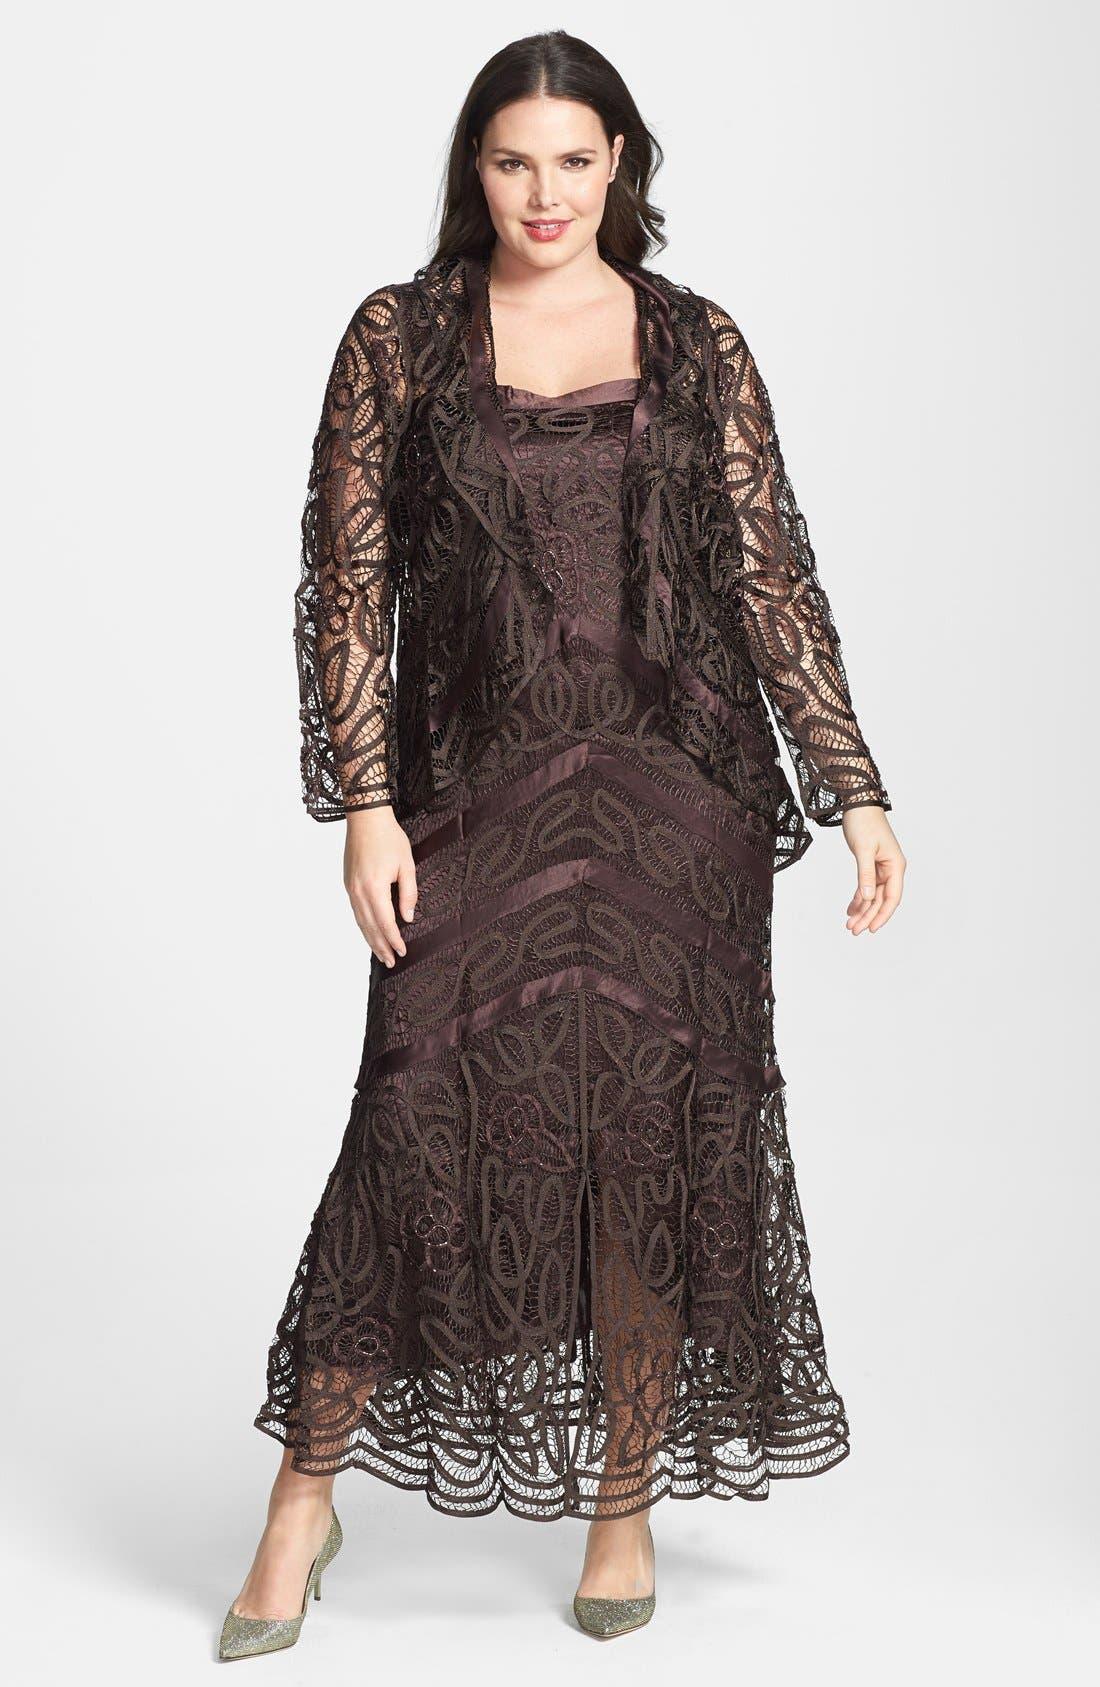 Main Image - Soulmates Bead Crochet Dress & Jacket (Plus)